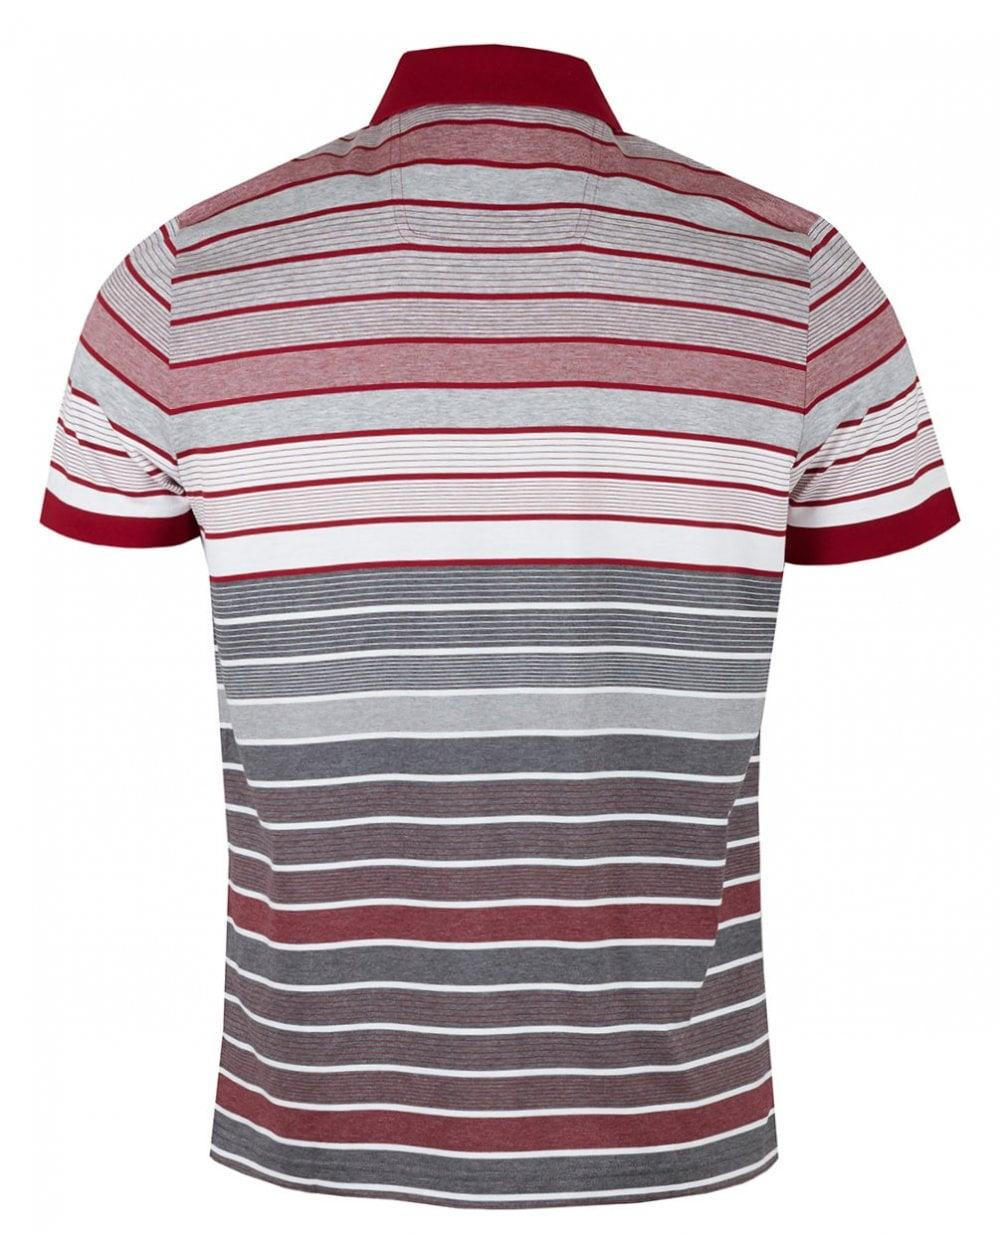 da7677a87 Lyst - BOSS Athleisure Paddy 3 Multi Striped Mercerised Polo for Men